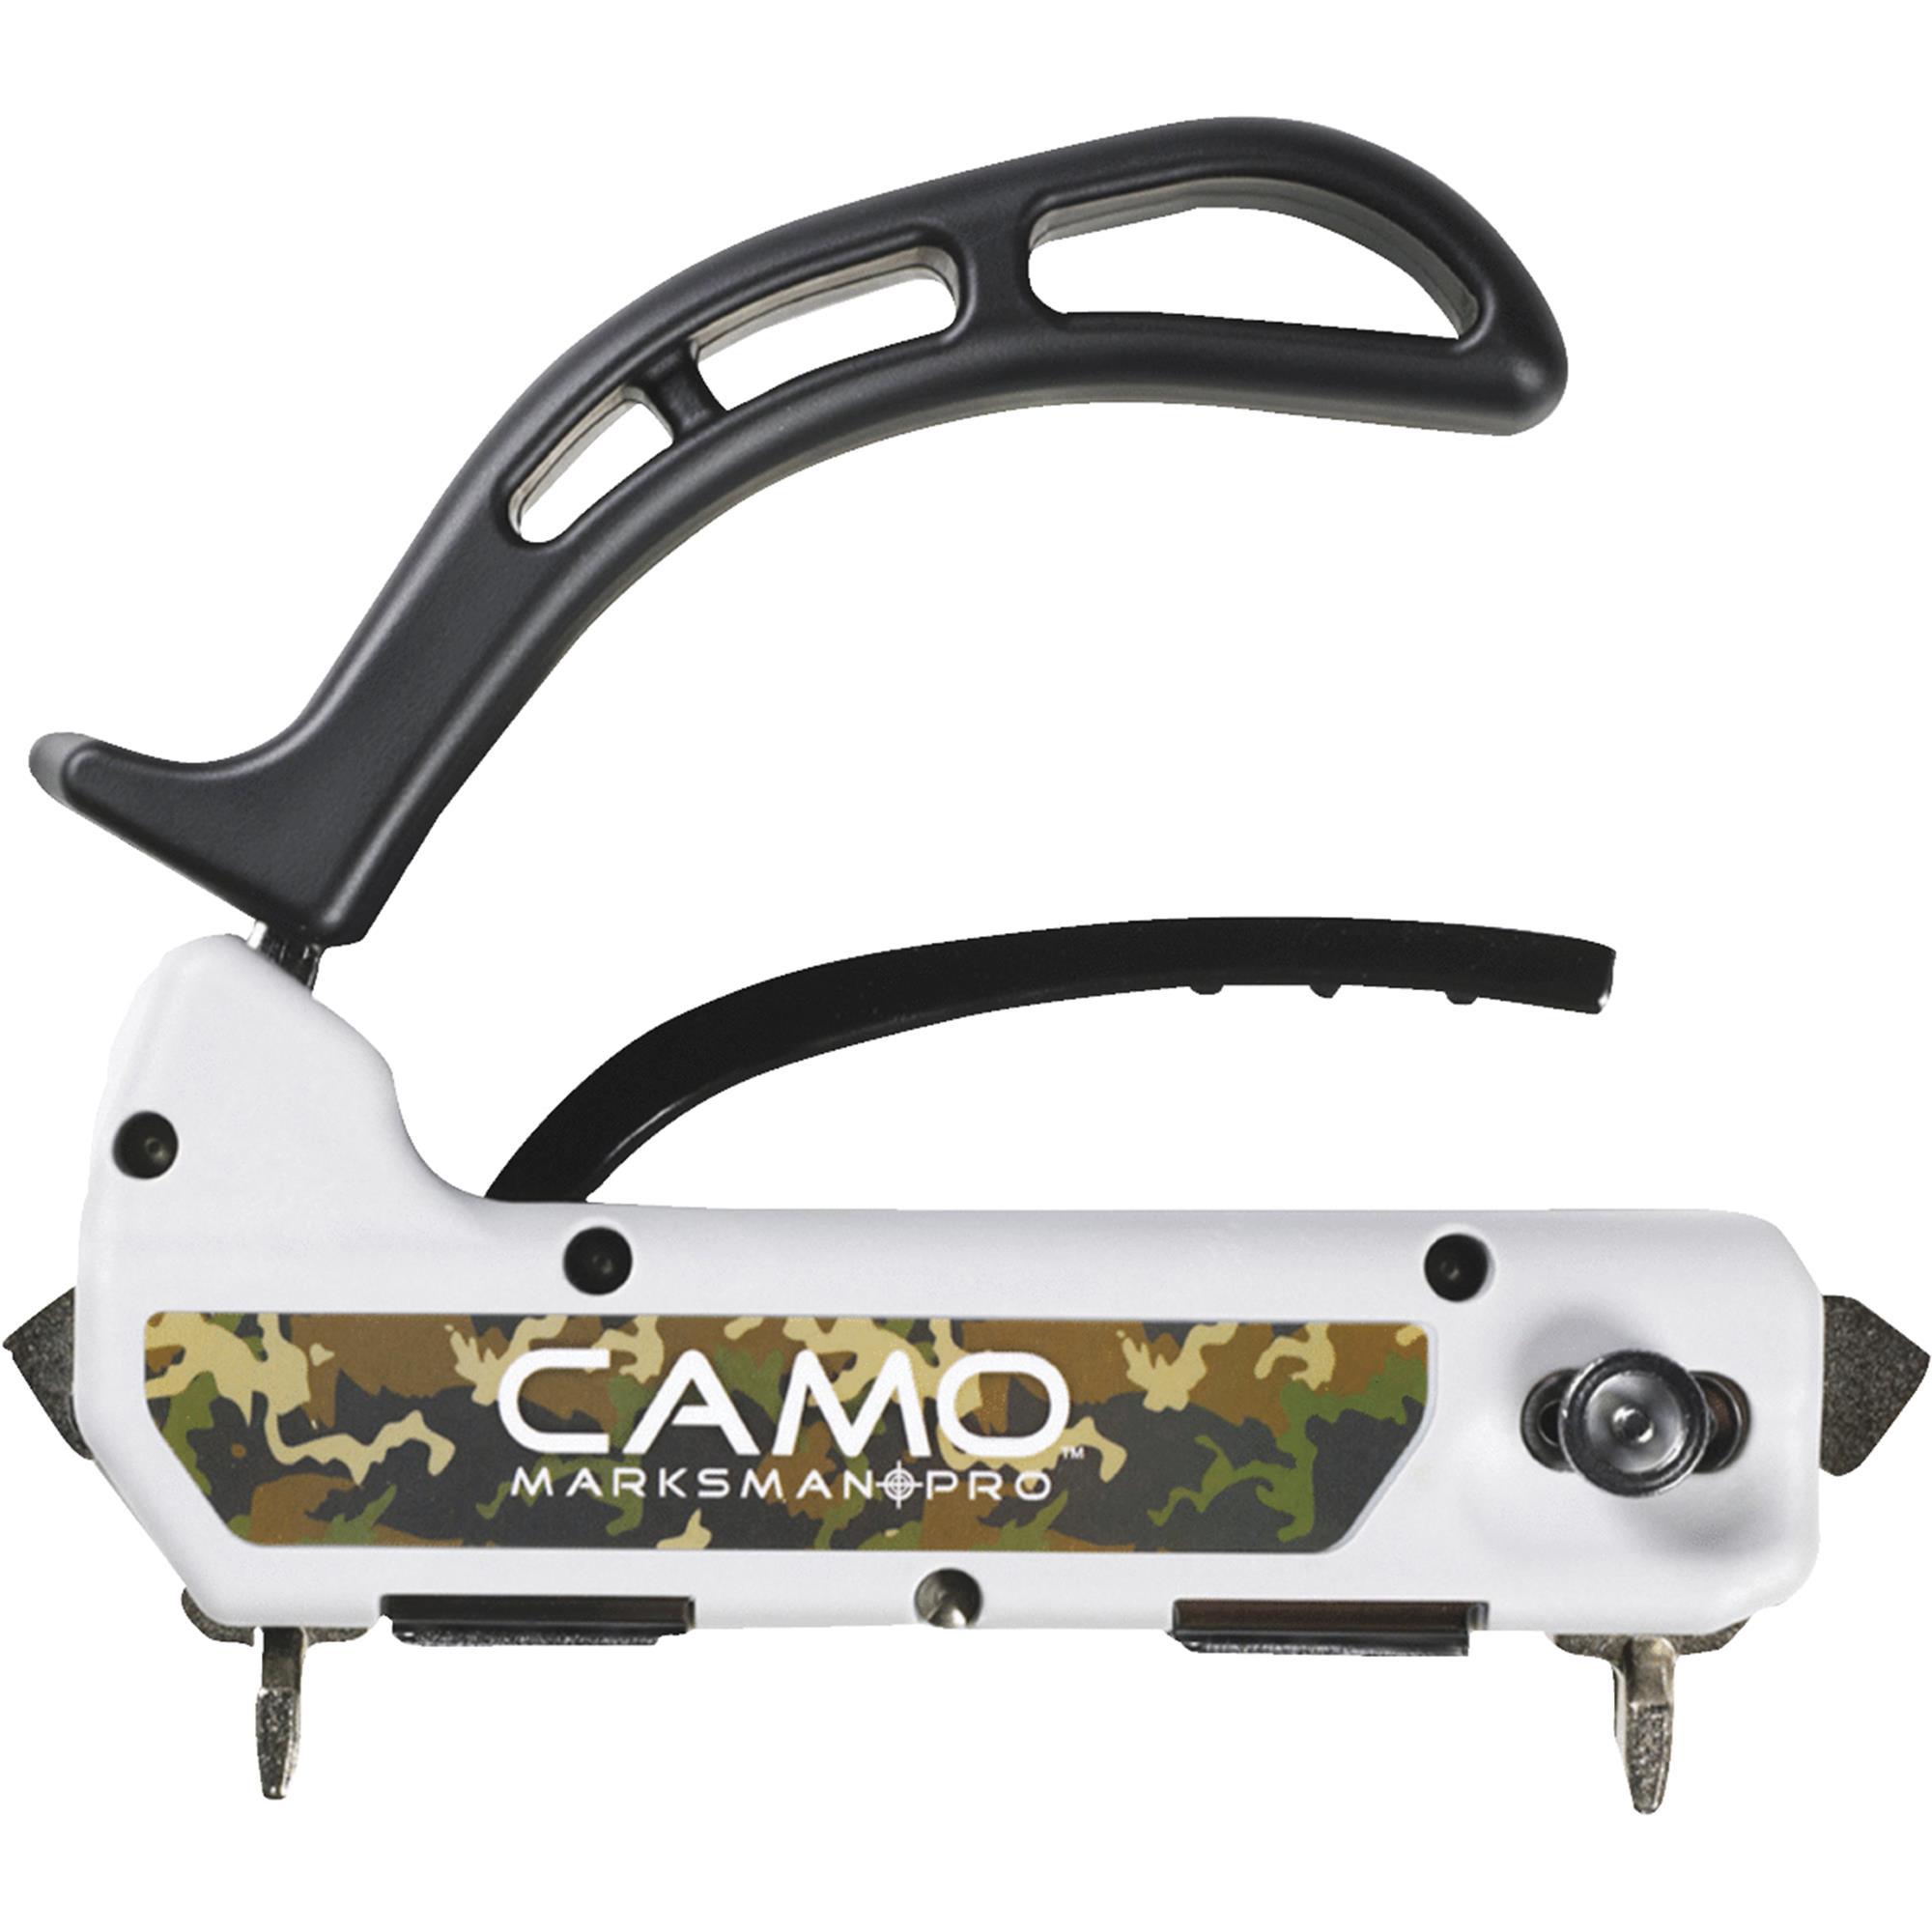 CAMO Marksman Pro Tool Hidden Deck Fastening System